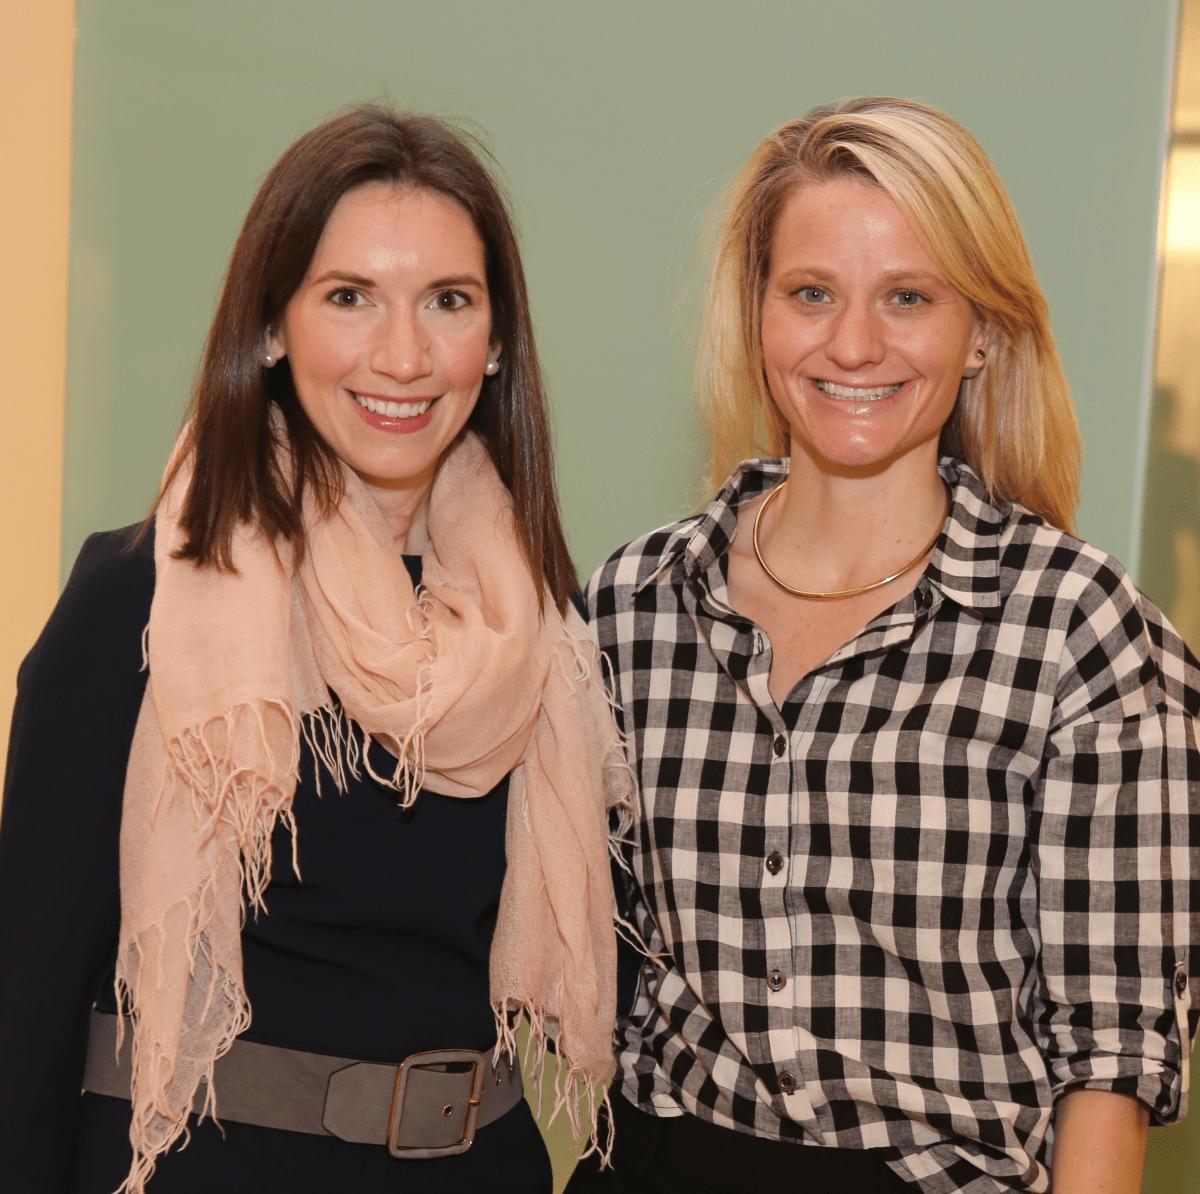 News, Shelby, Decorative Center Houston Fall Market, Nov. 2015, Alison Meyer, Corinne Plumhoff